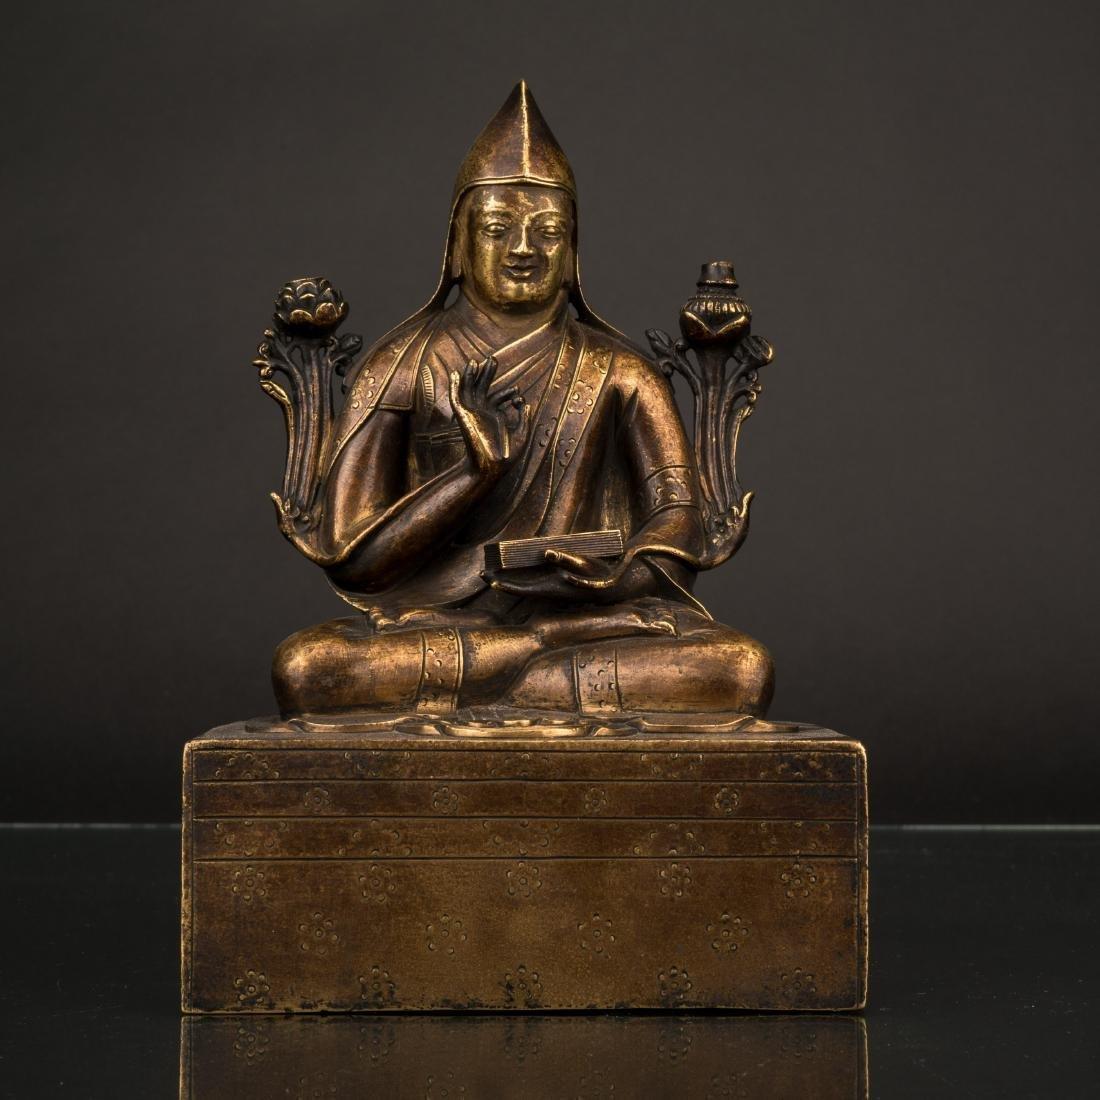 QING GILT BRONZE BUDDHA OF GENDUN DRUB, FIRST DALAI